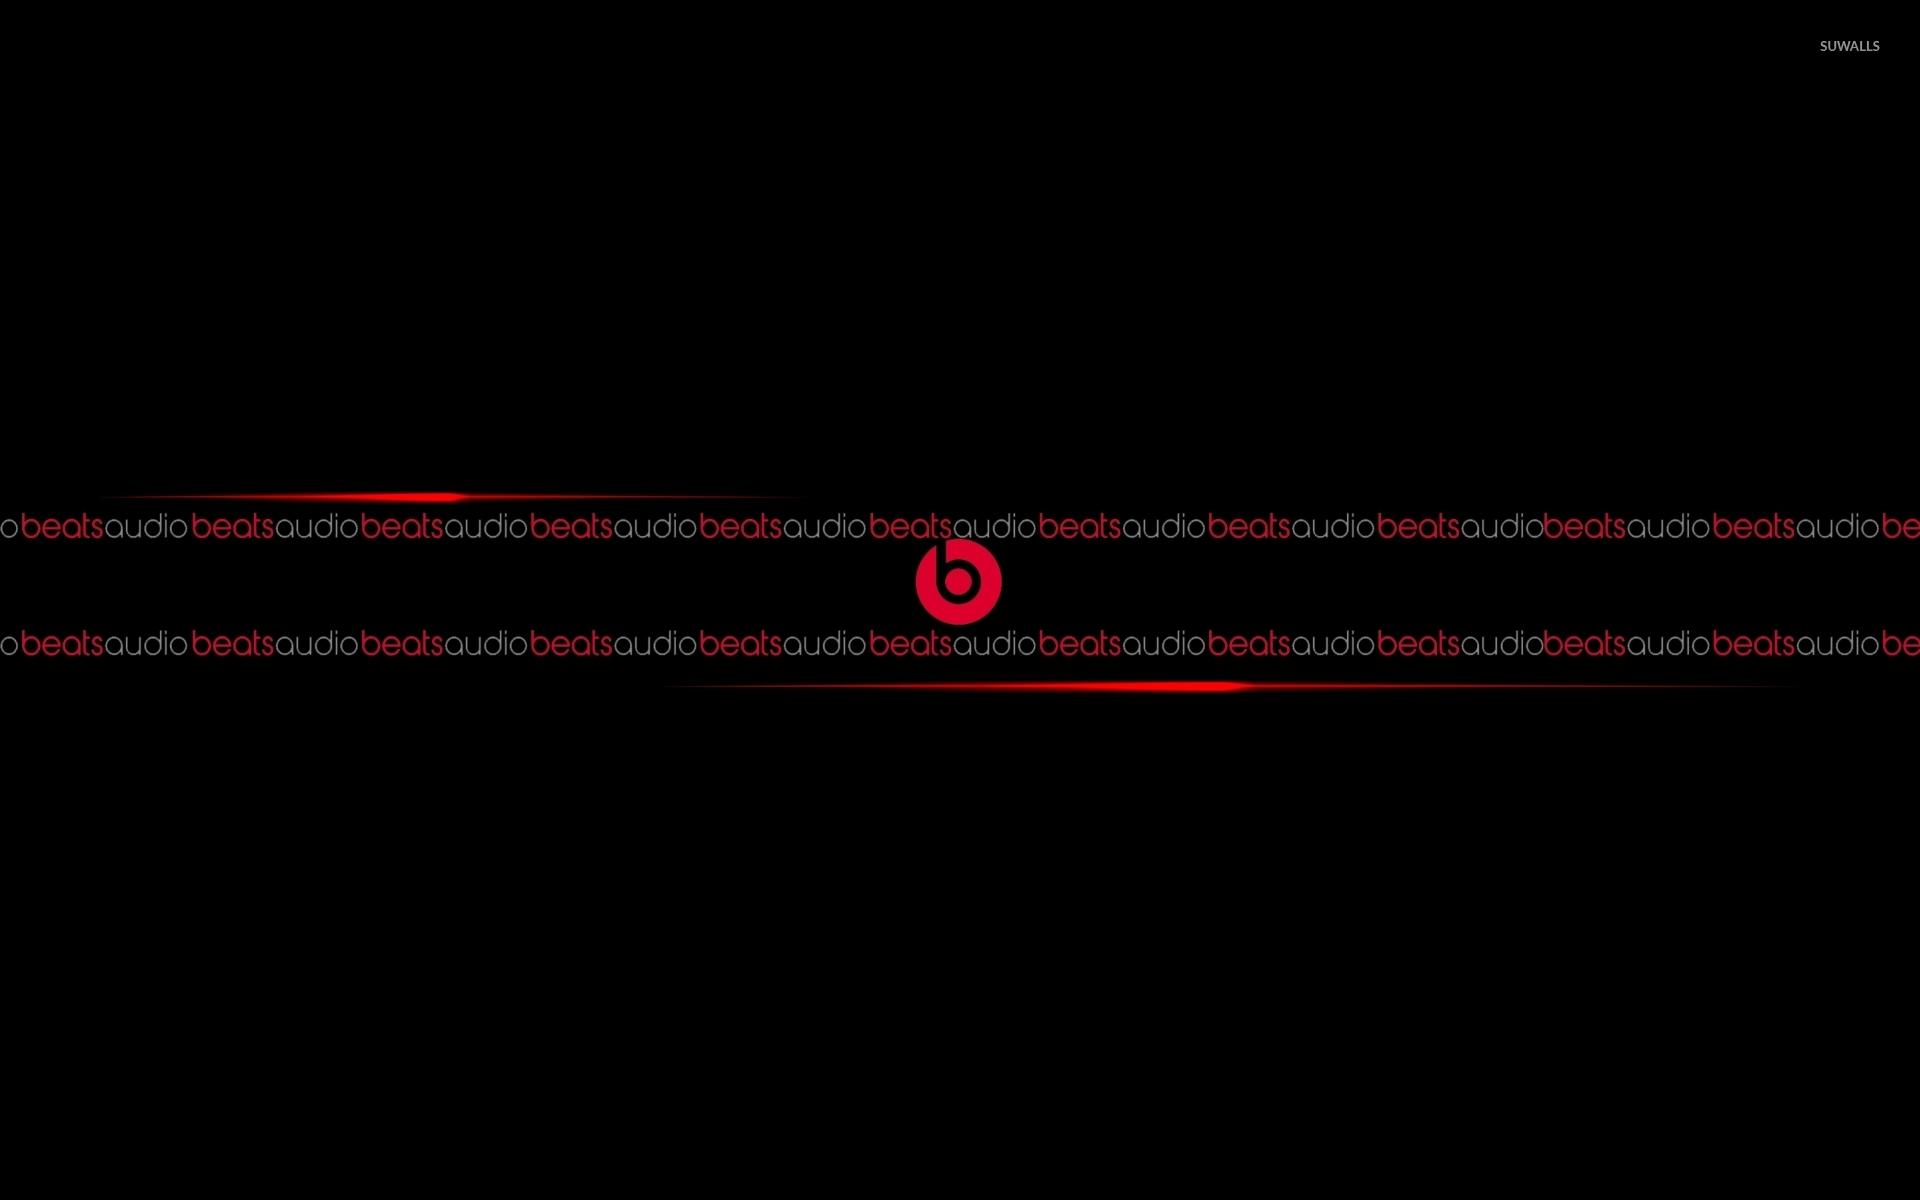 Beats Audio wallpaper Music wallpapers